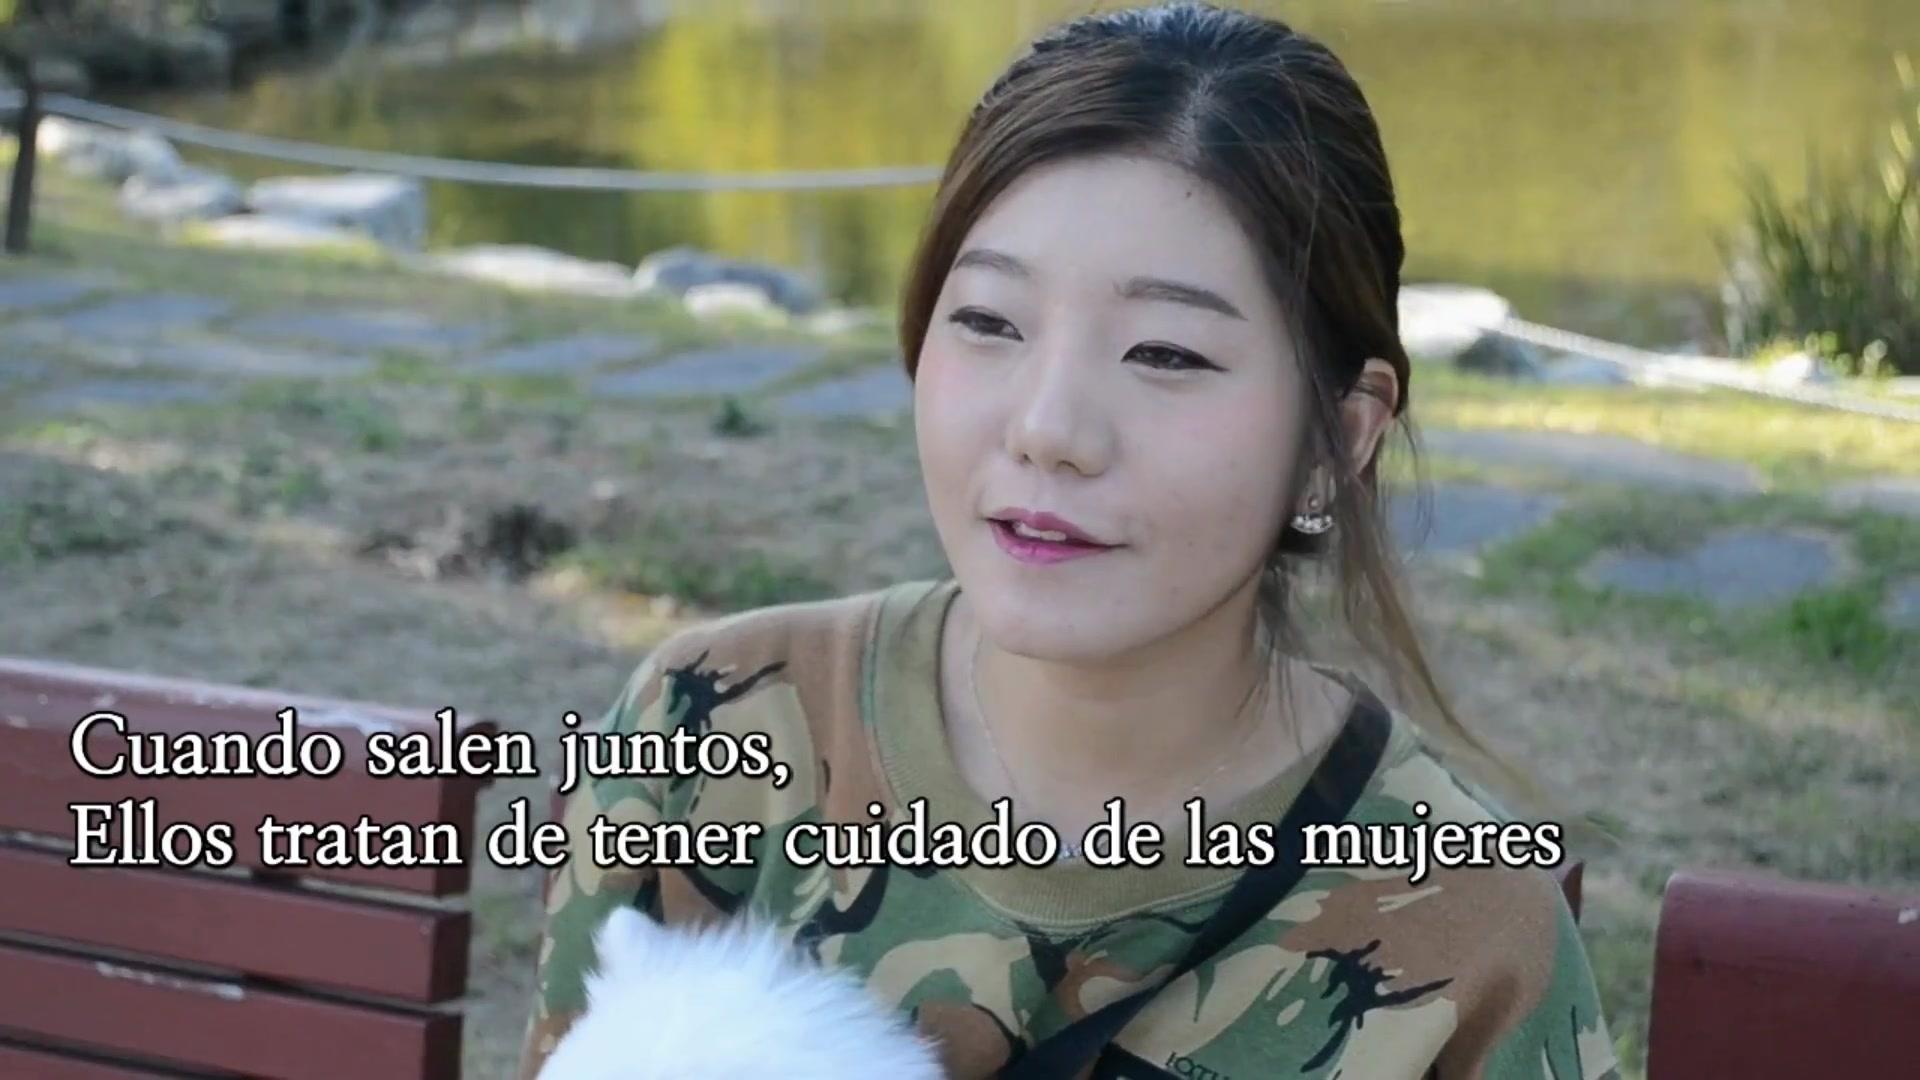 Todo Sobre Corea del Sur Episode 122: What Do Korean Women Think About Latinas and Spanish?